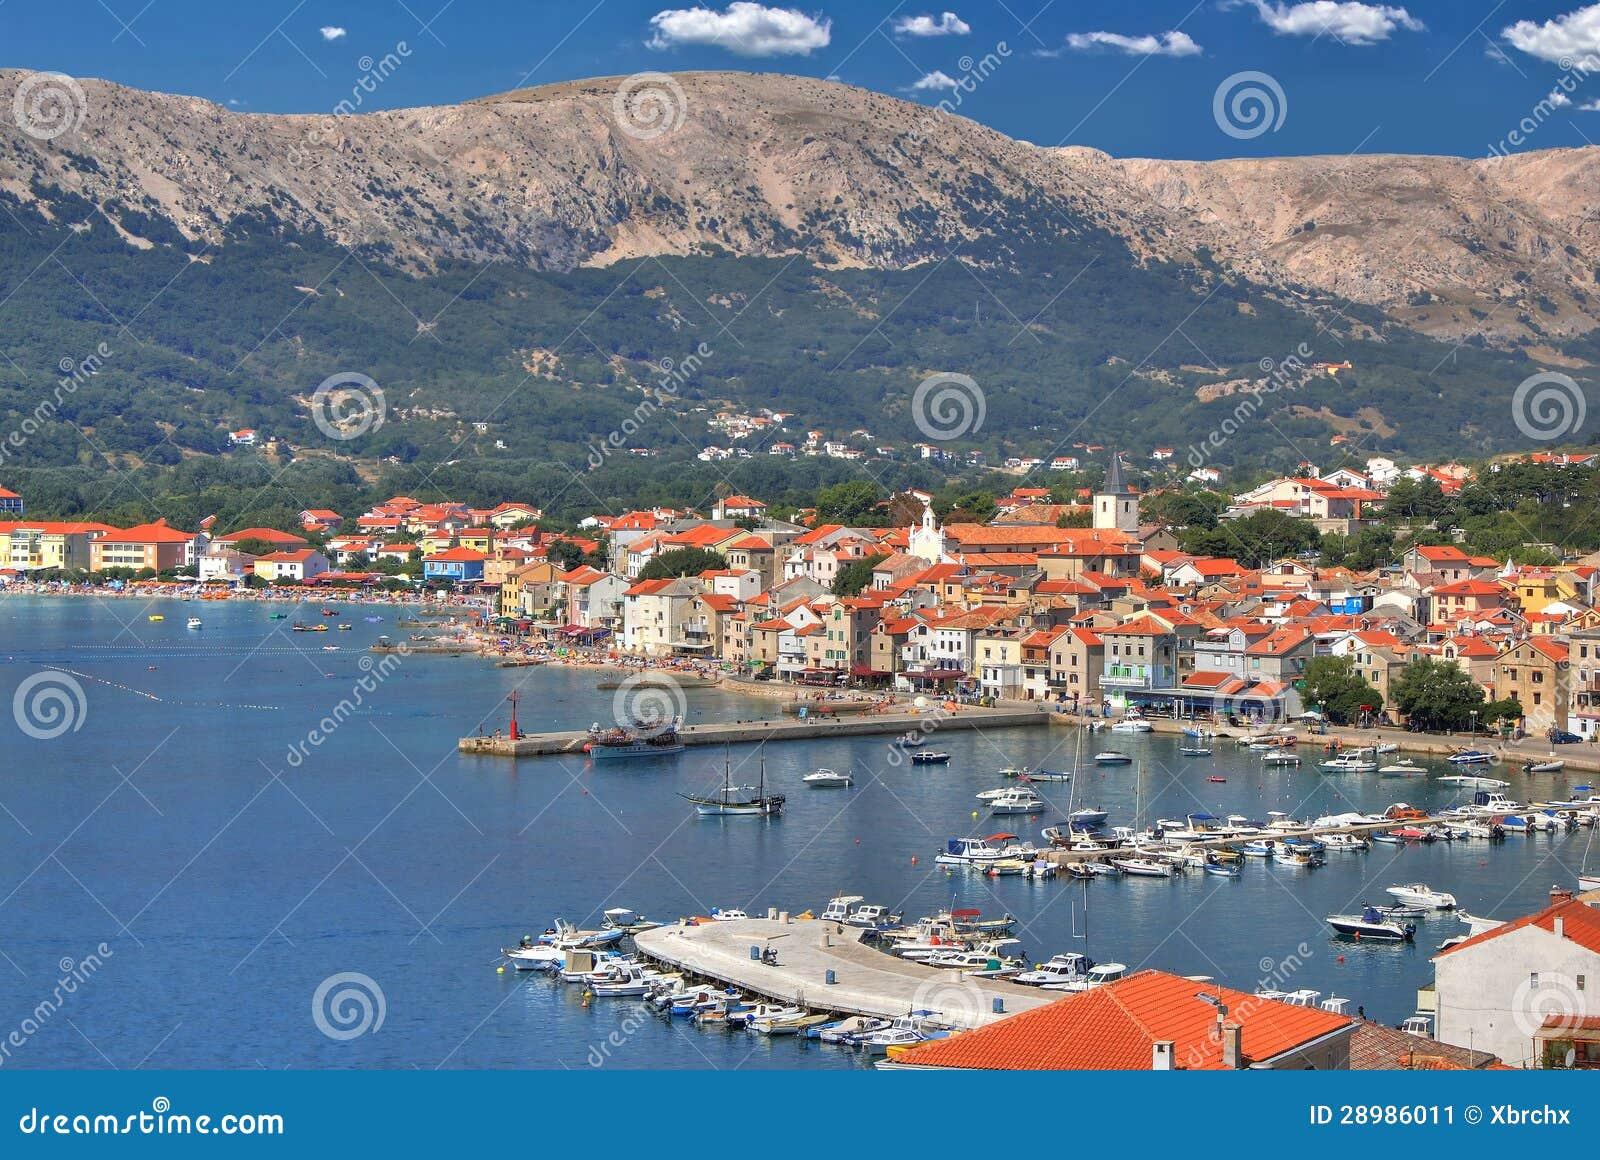 Ville de bord de mer de Baska, île de Krk